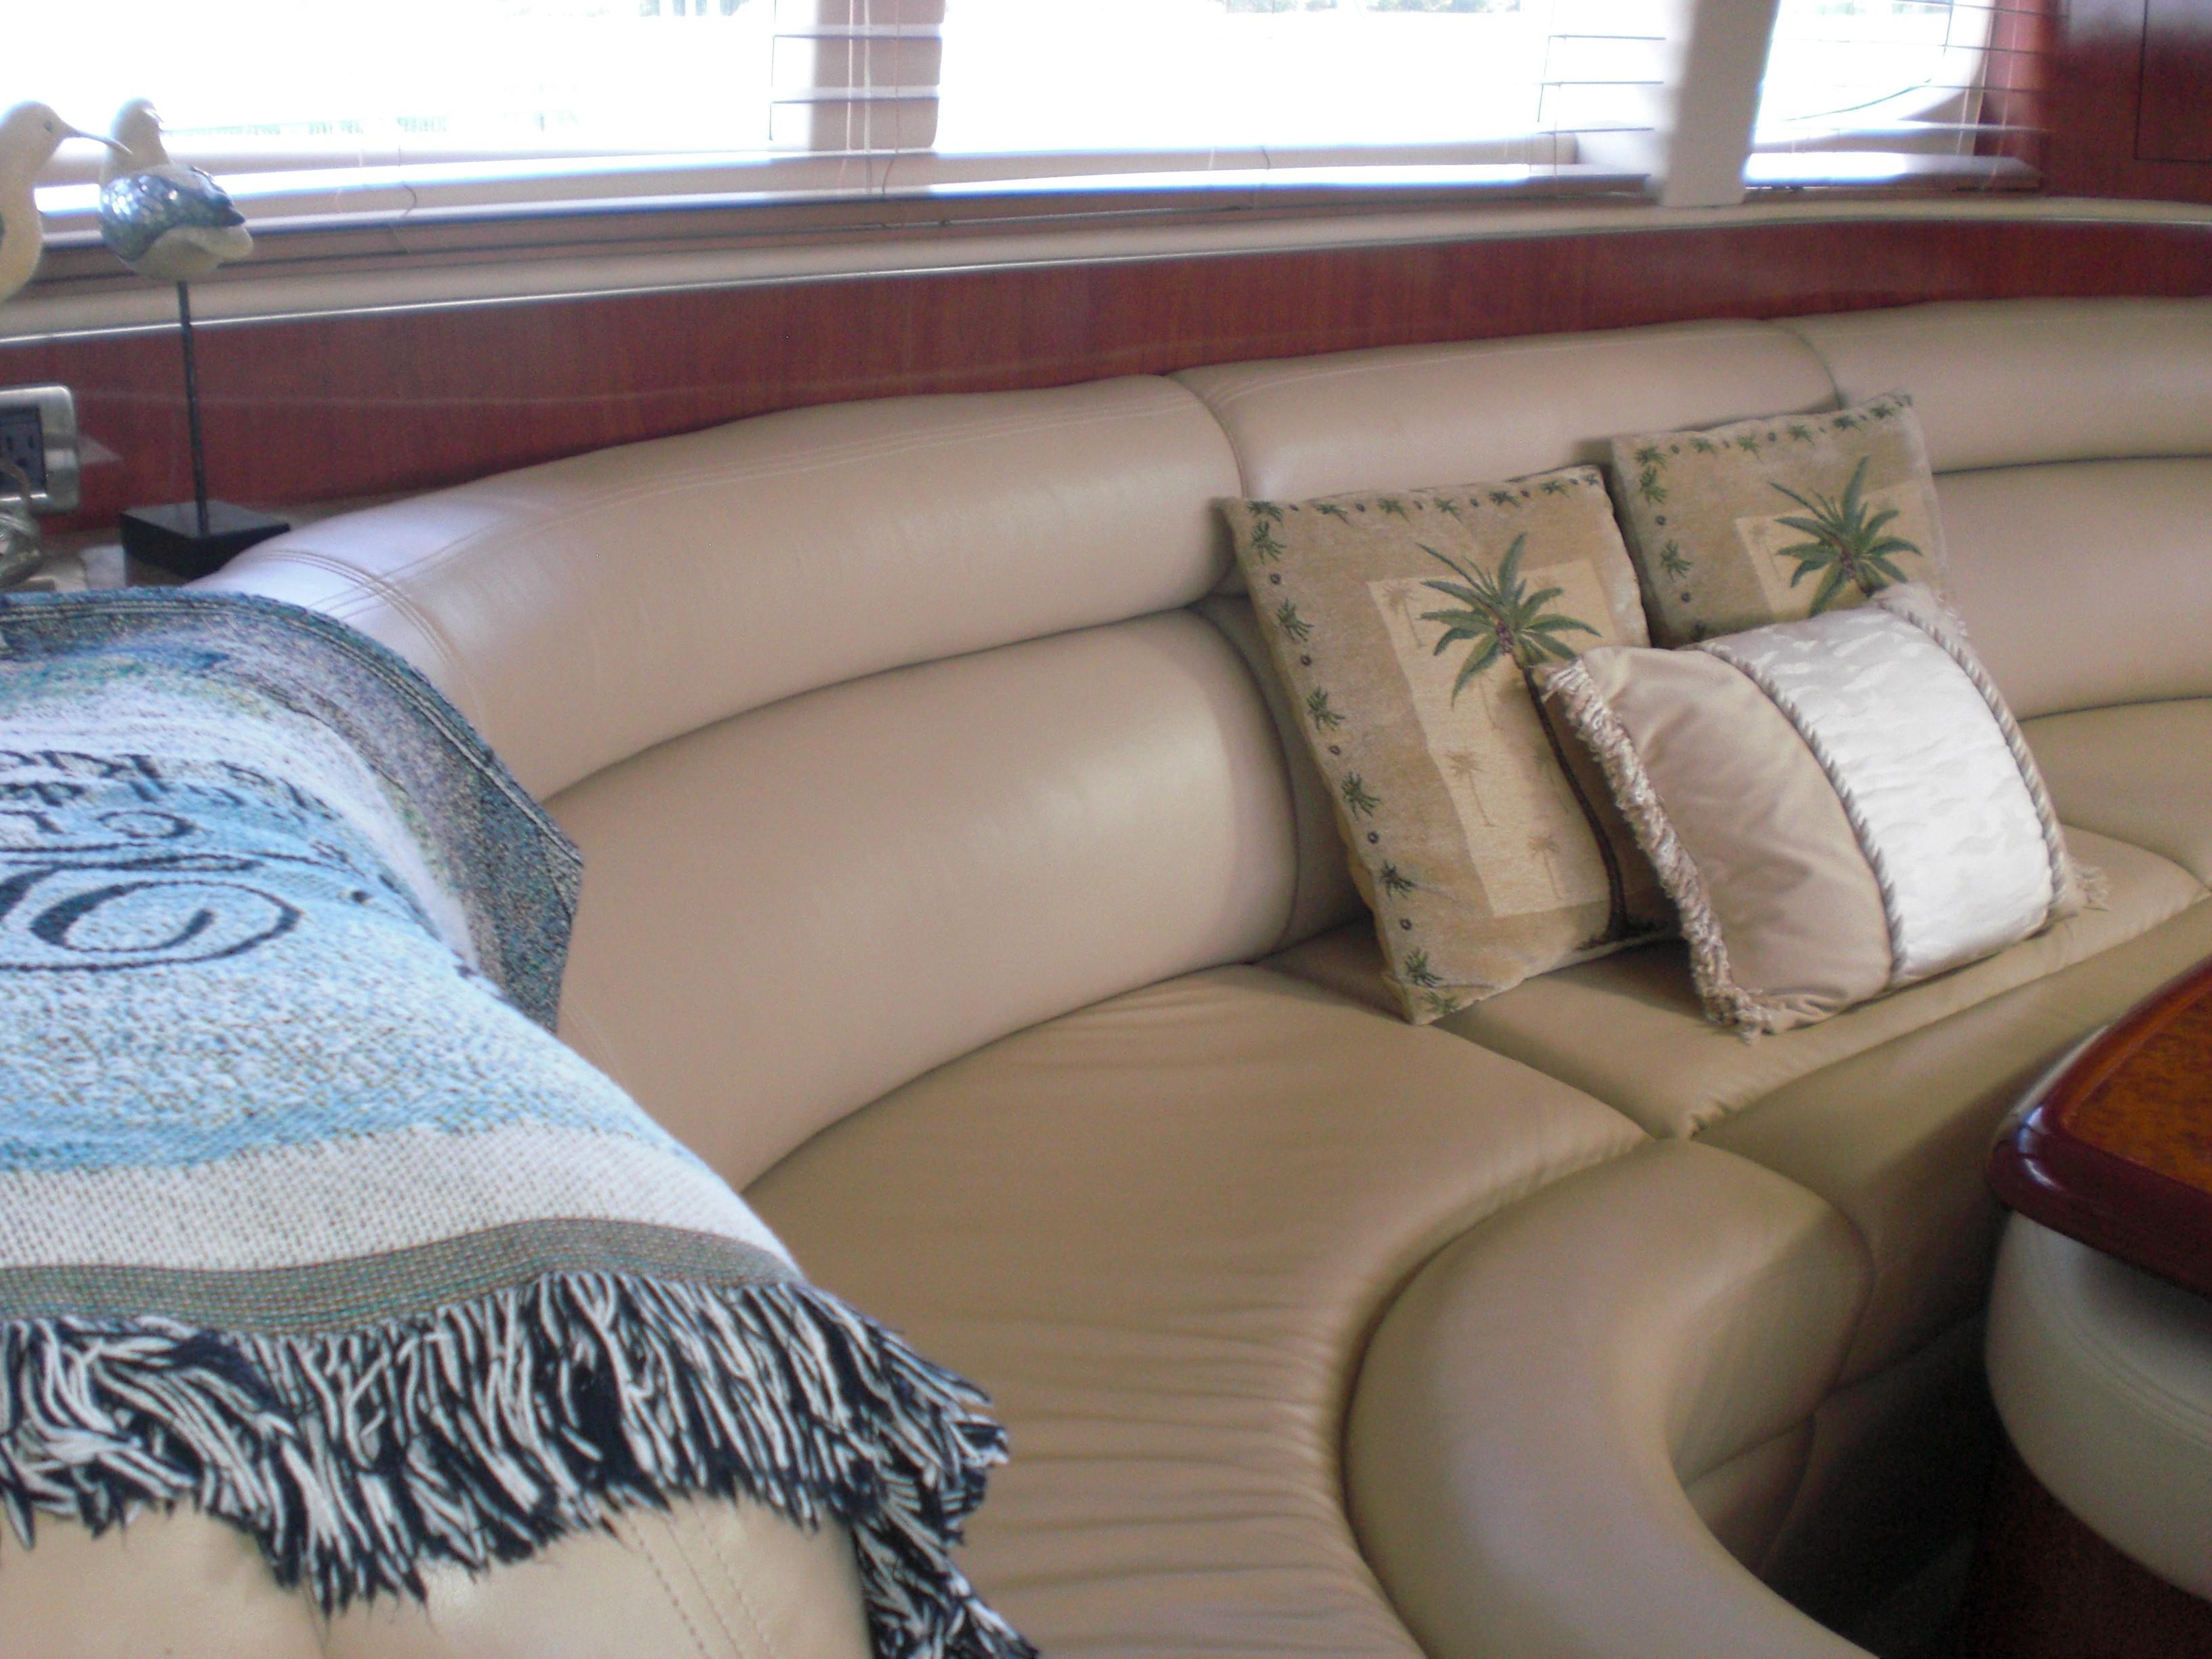 Sea Ray 480 Motor Yacht - Salon Sofa